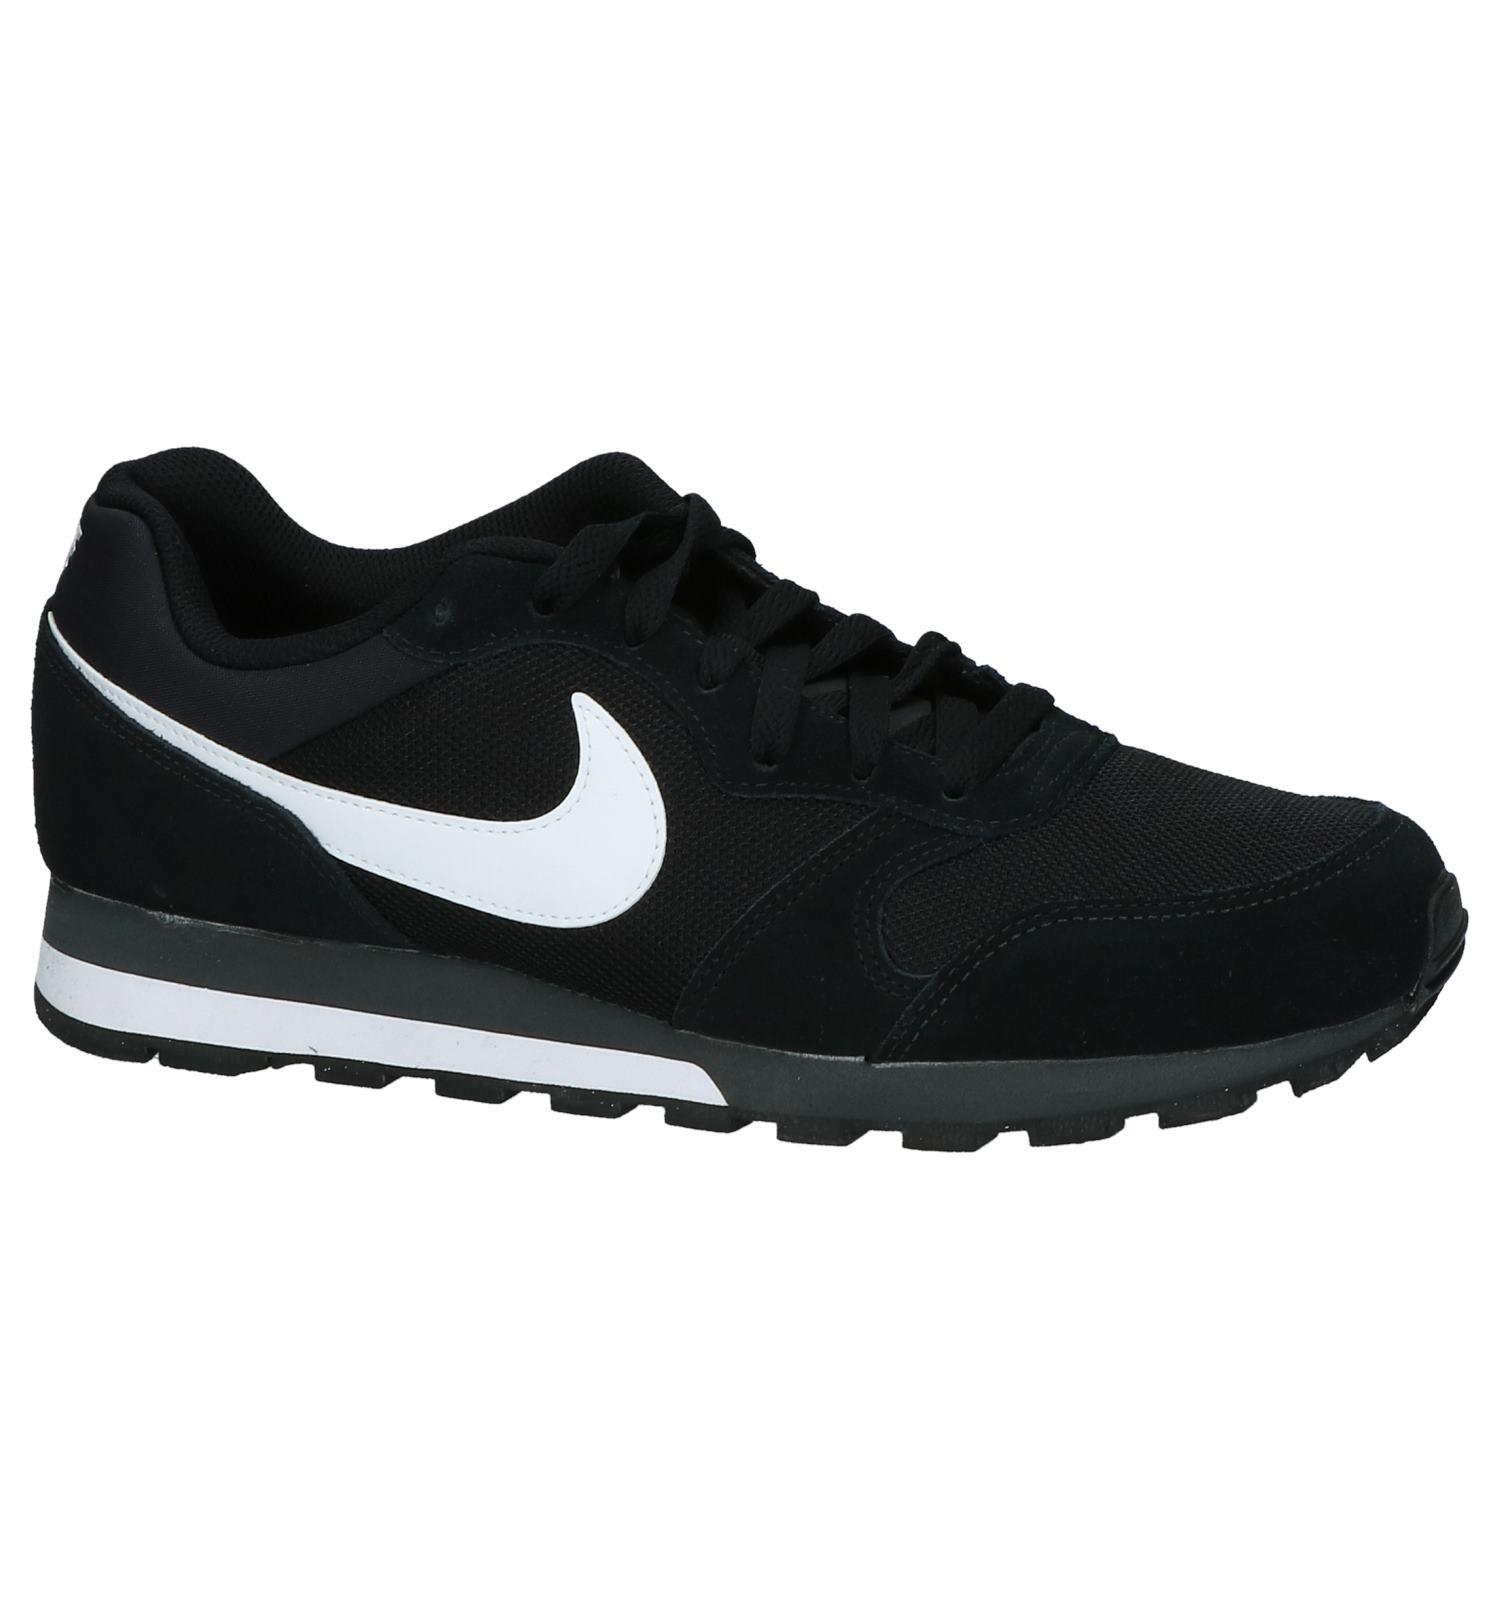 110f84ec3d3 Zwarte Lage Sneakers Nike MD Runner 2   TORFS.BE   Gratis verzend en retour